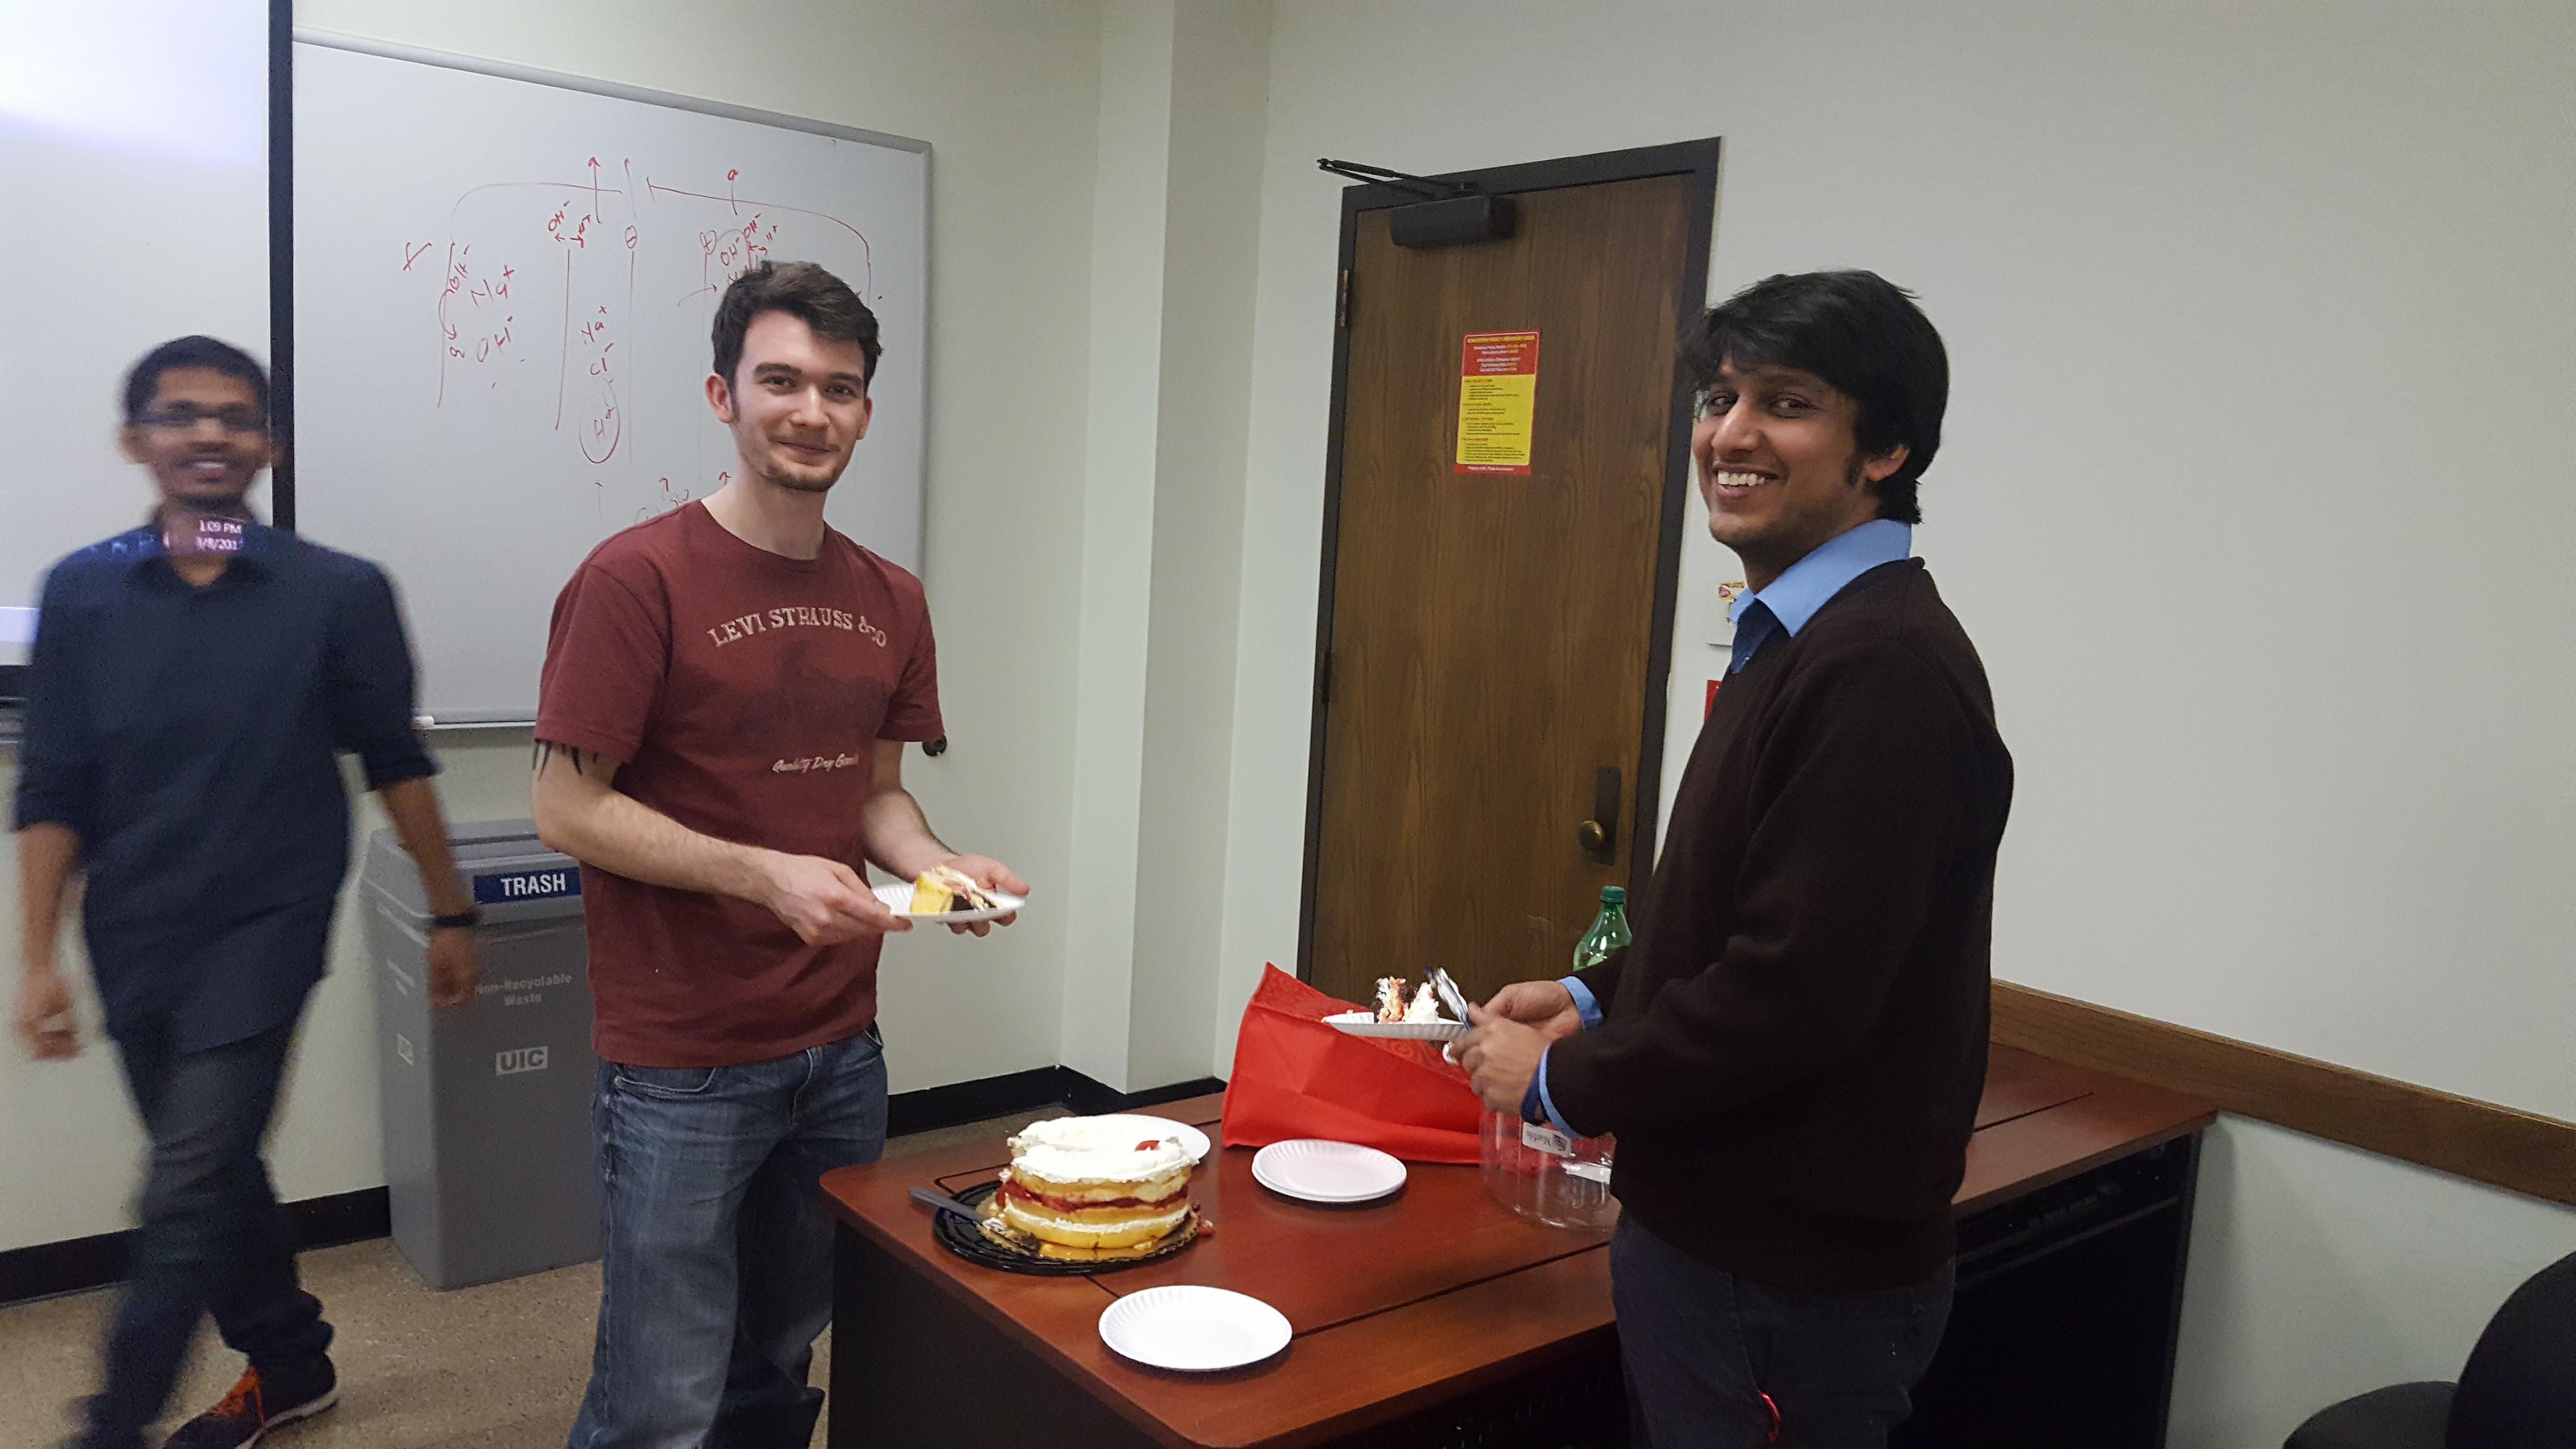 Happy Birthday, James & Aditya!